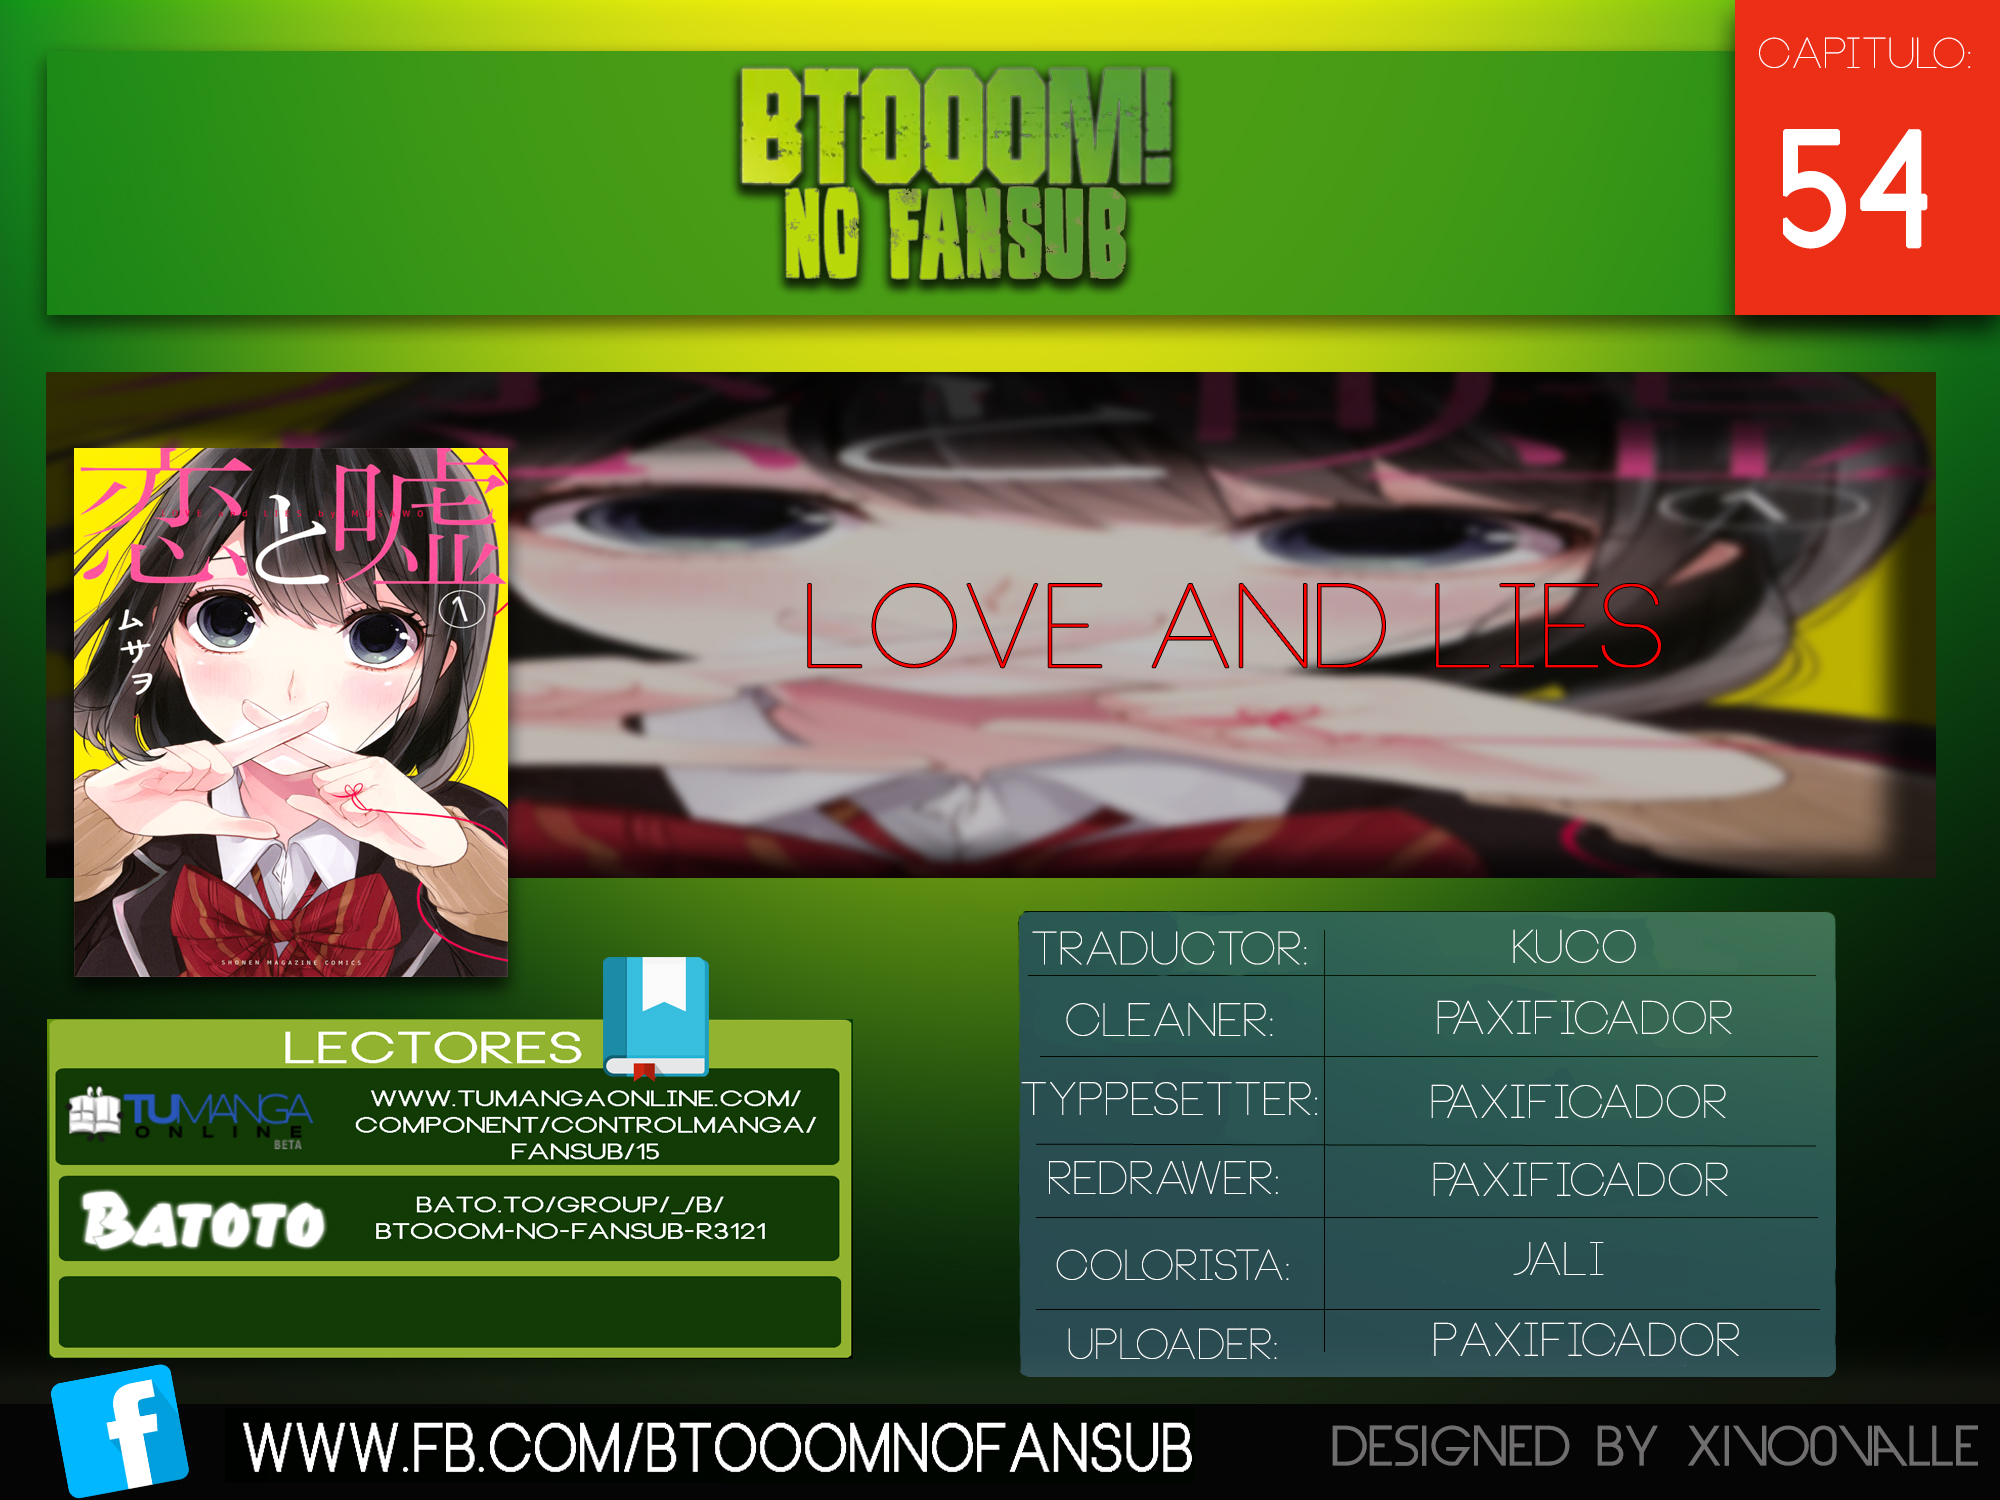 https://c5.ninemanga.com/es_manga/14/14734/416556/db7153cd33dfe7c9d20694adabfd339c.jpg Page 1